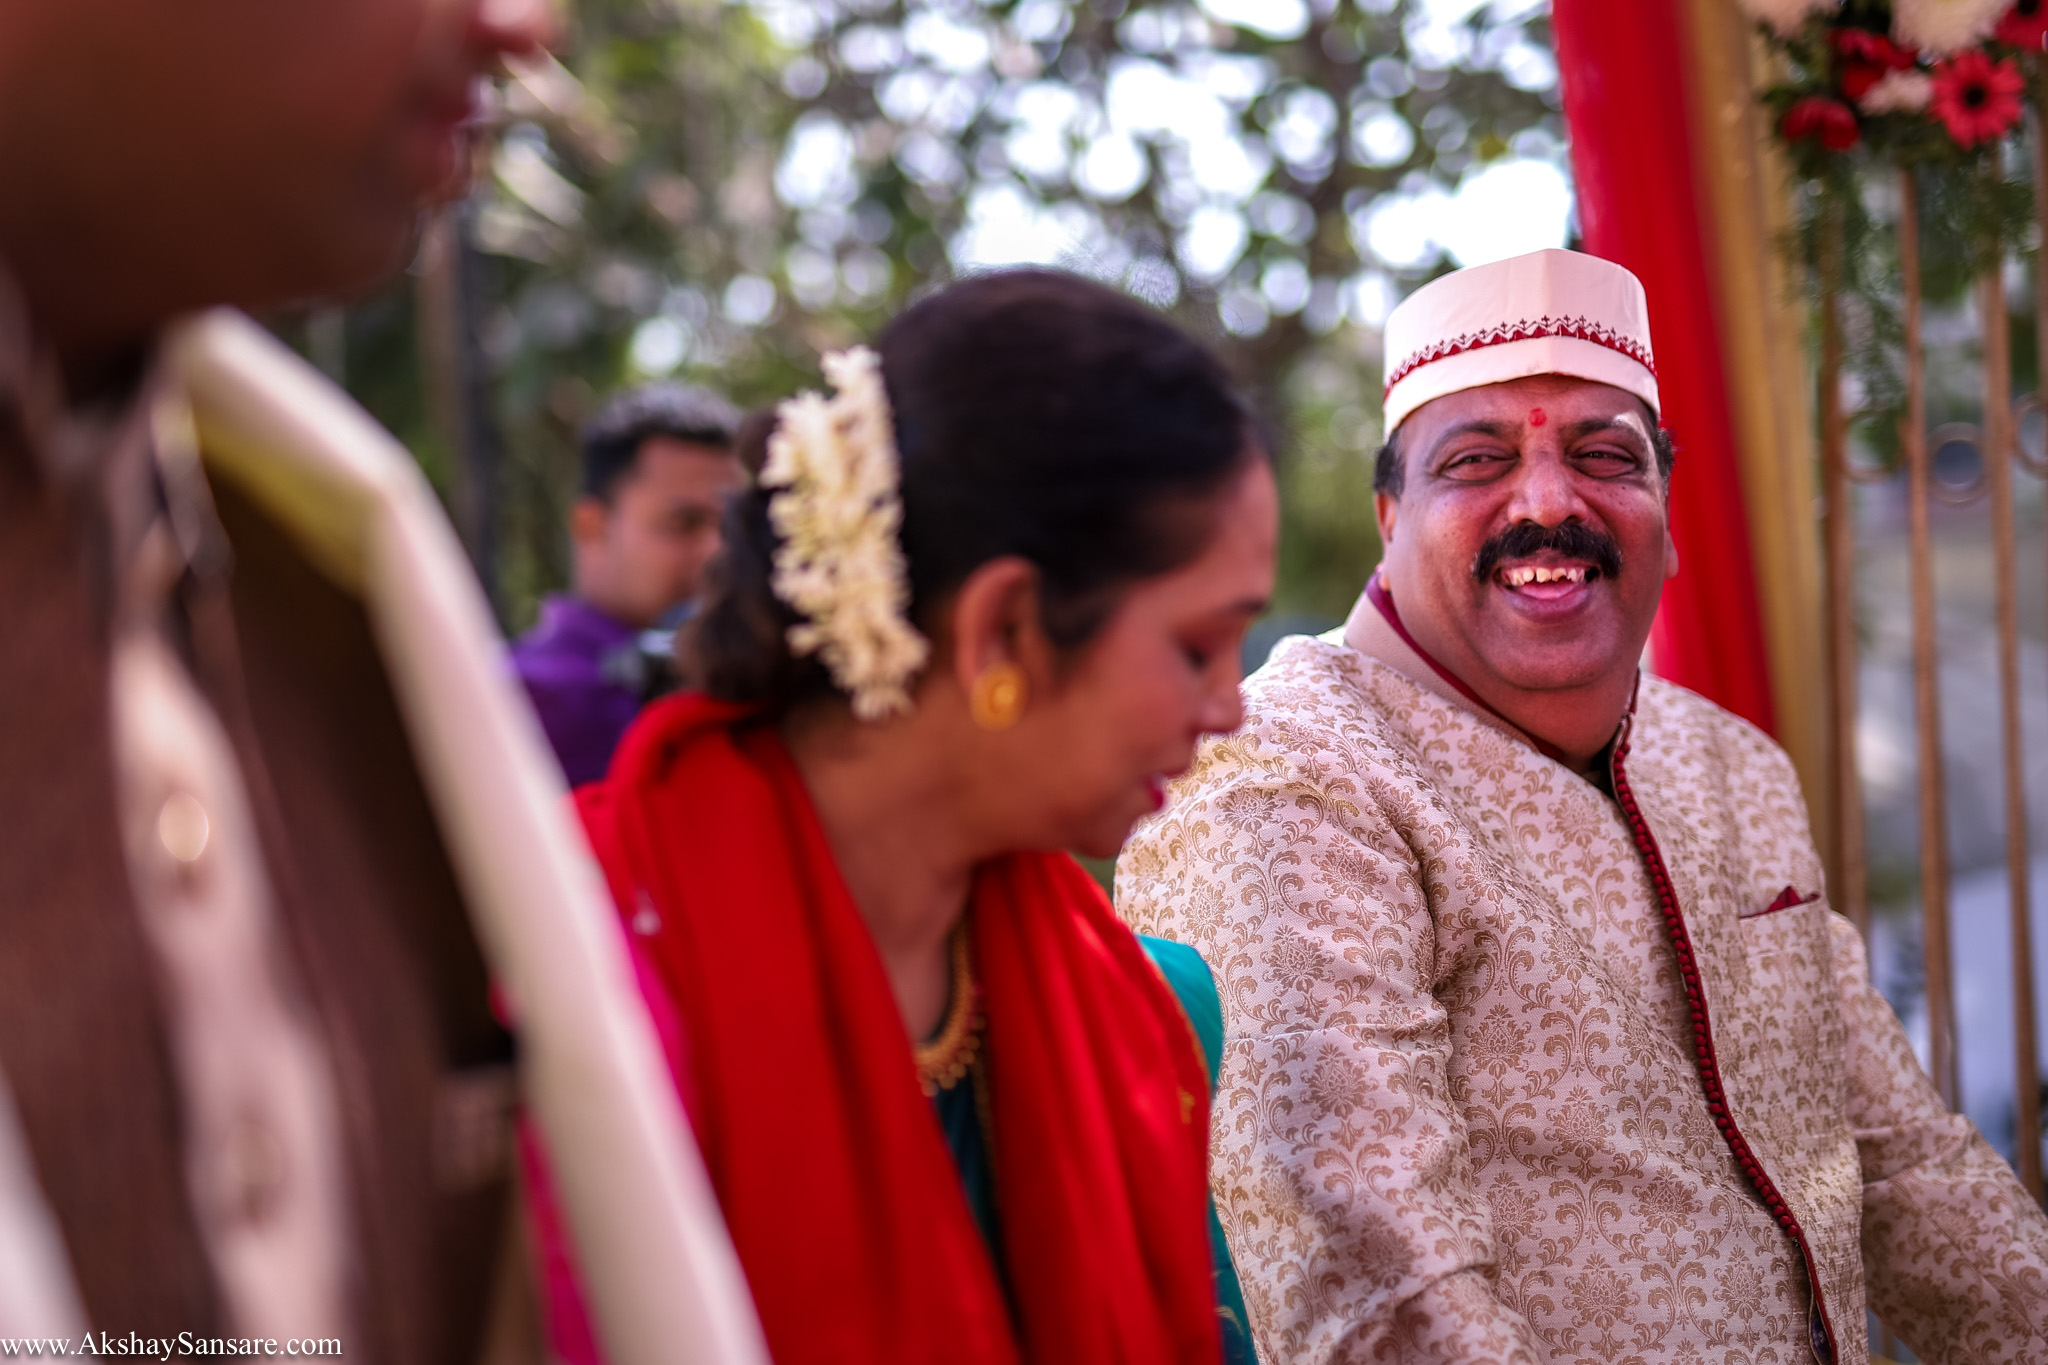 Salil x Kimaya Akshay Sansare Photography Candid wedding Photographer in mumbai best(12).jpg